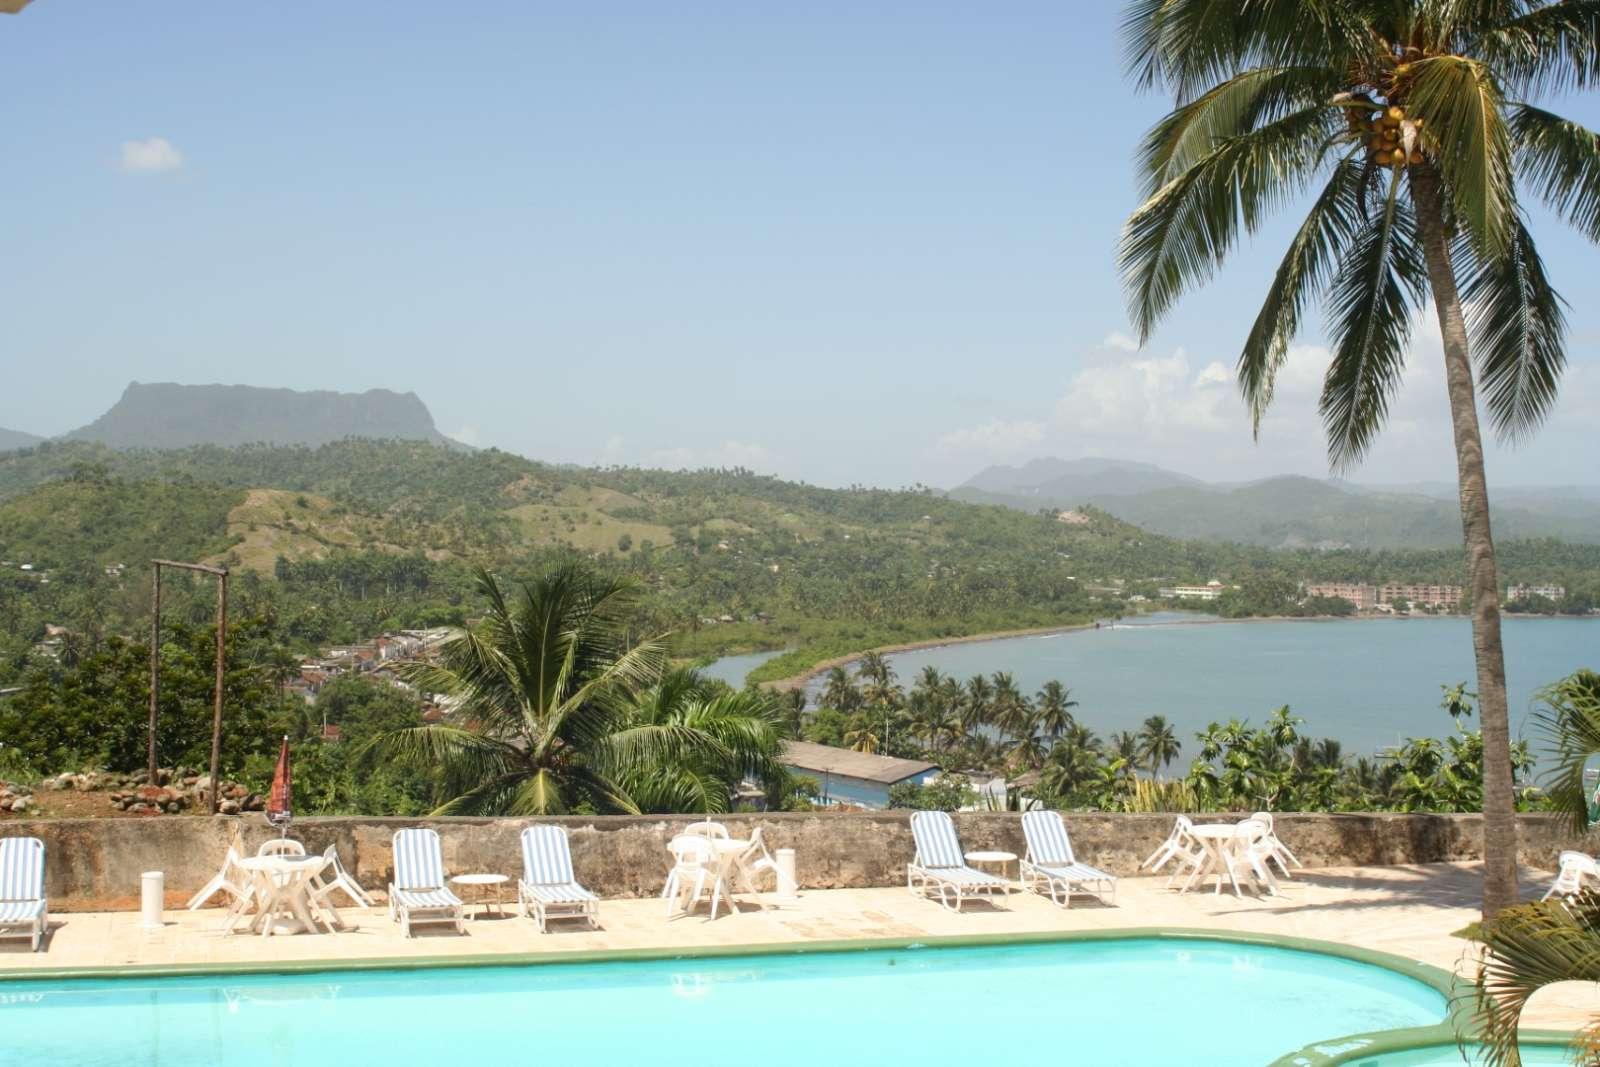 View over Baracoa bay from Hotel El Castillo